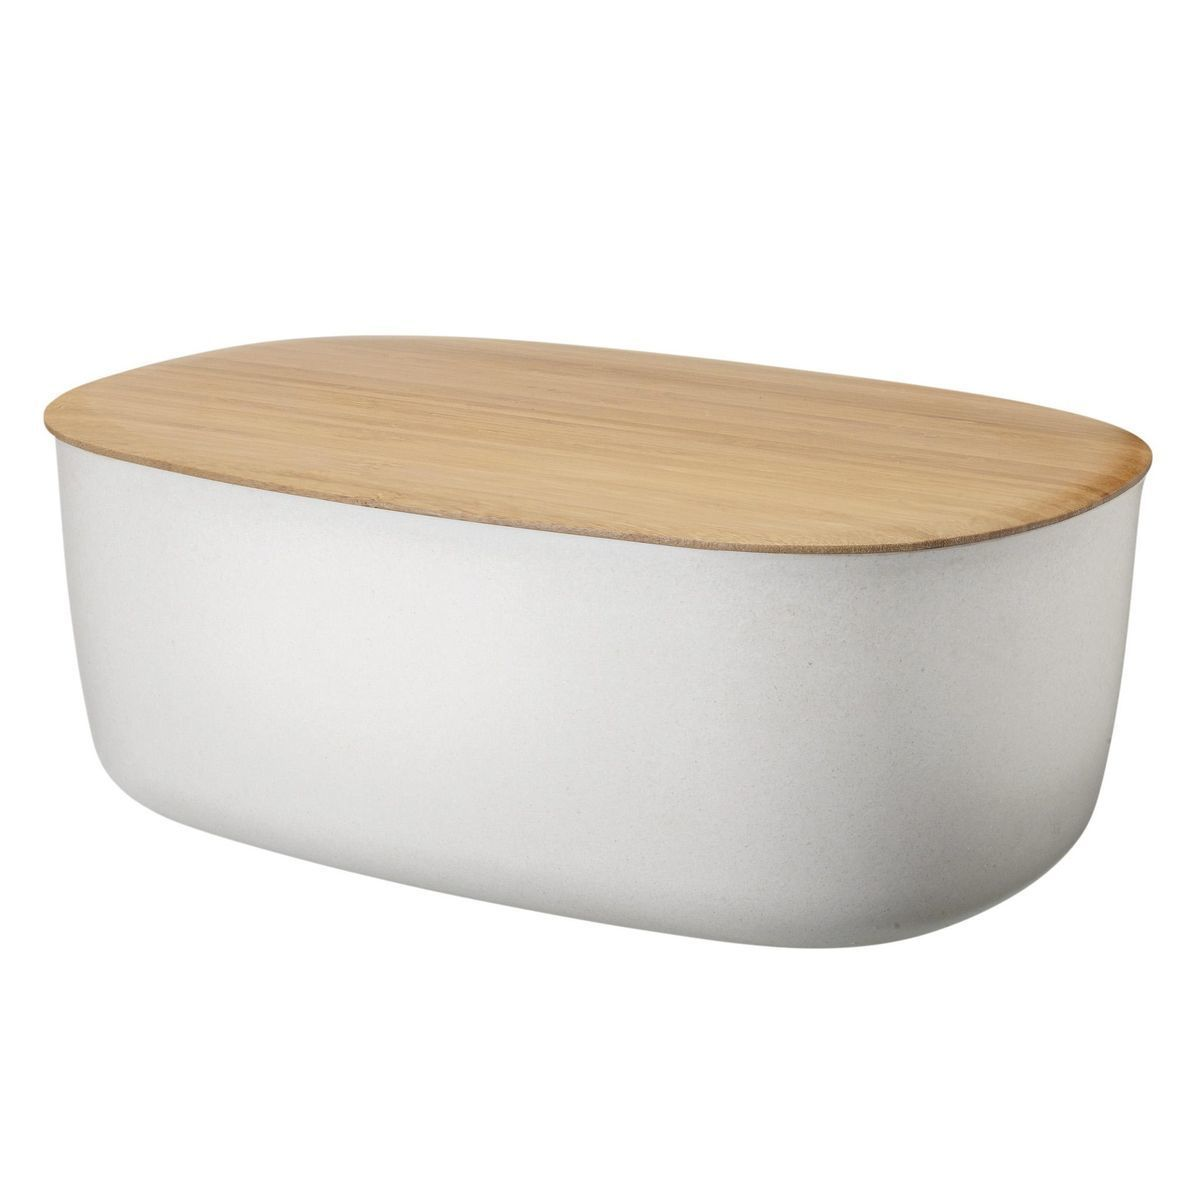 rig tig box it bo te pain rig tig. Black Bedroom Furniture Sets. Home Design Ideas